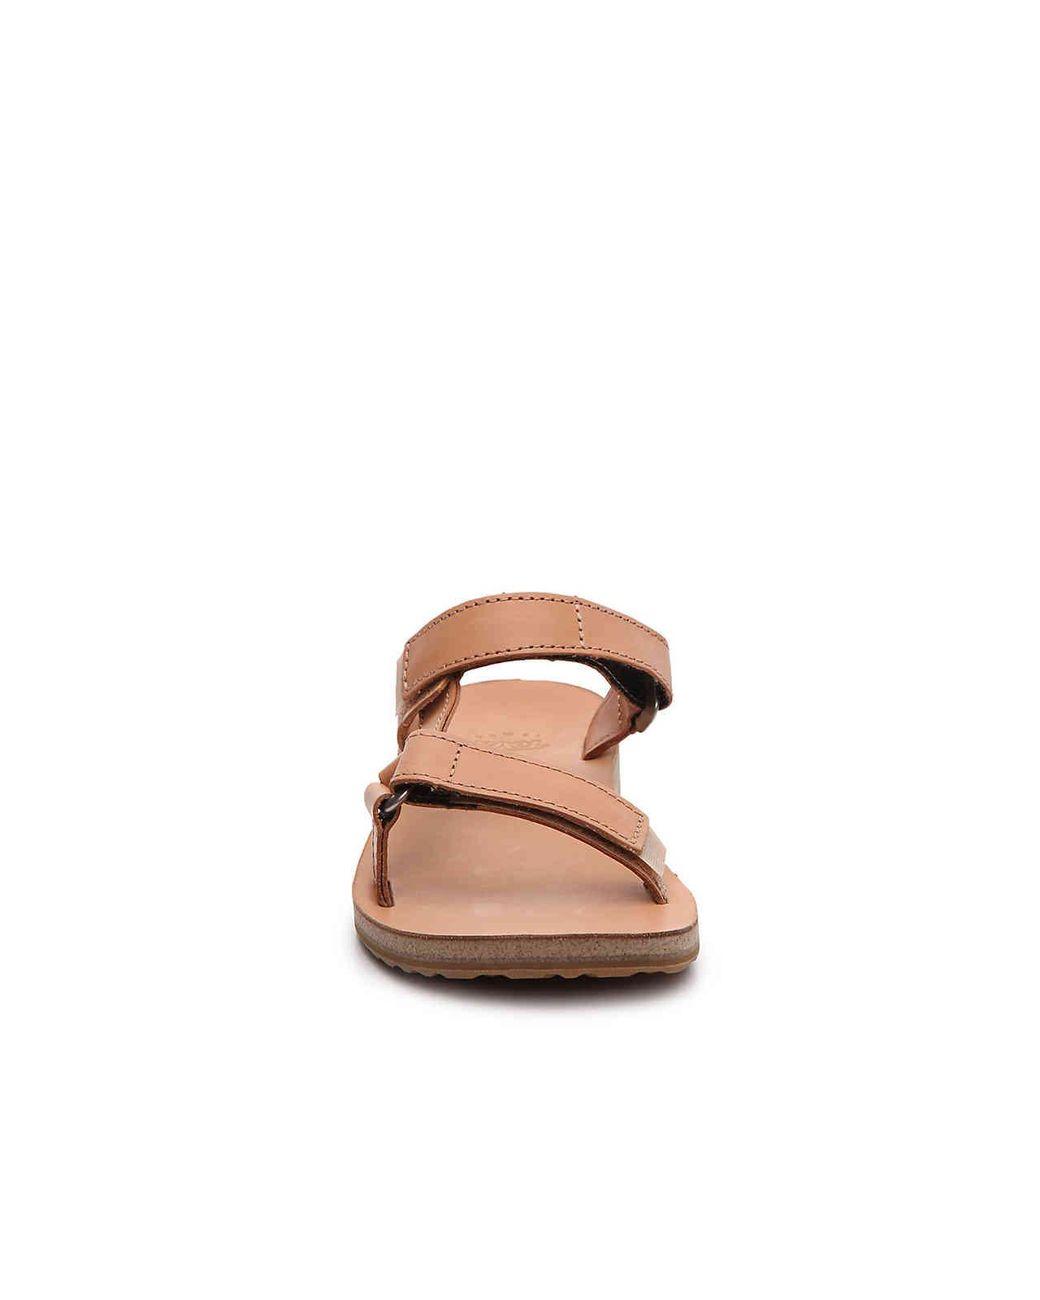 8fb627151 Lyst - Teva Universal Slide Leather Flat Sandal in Brown